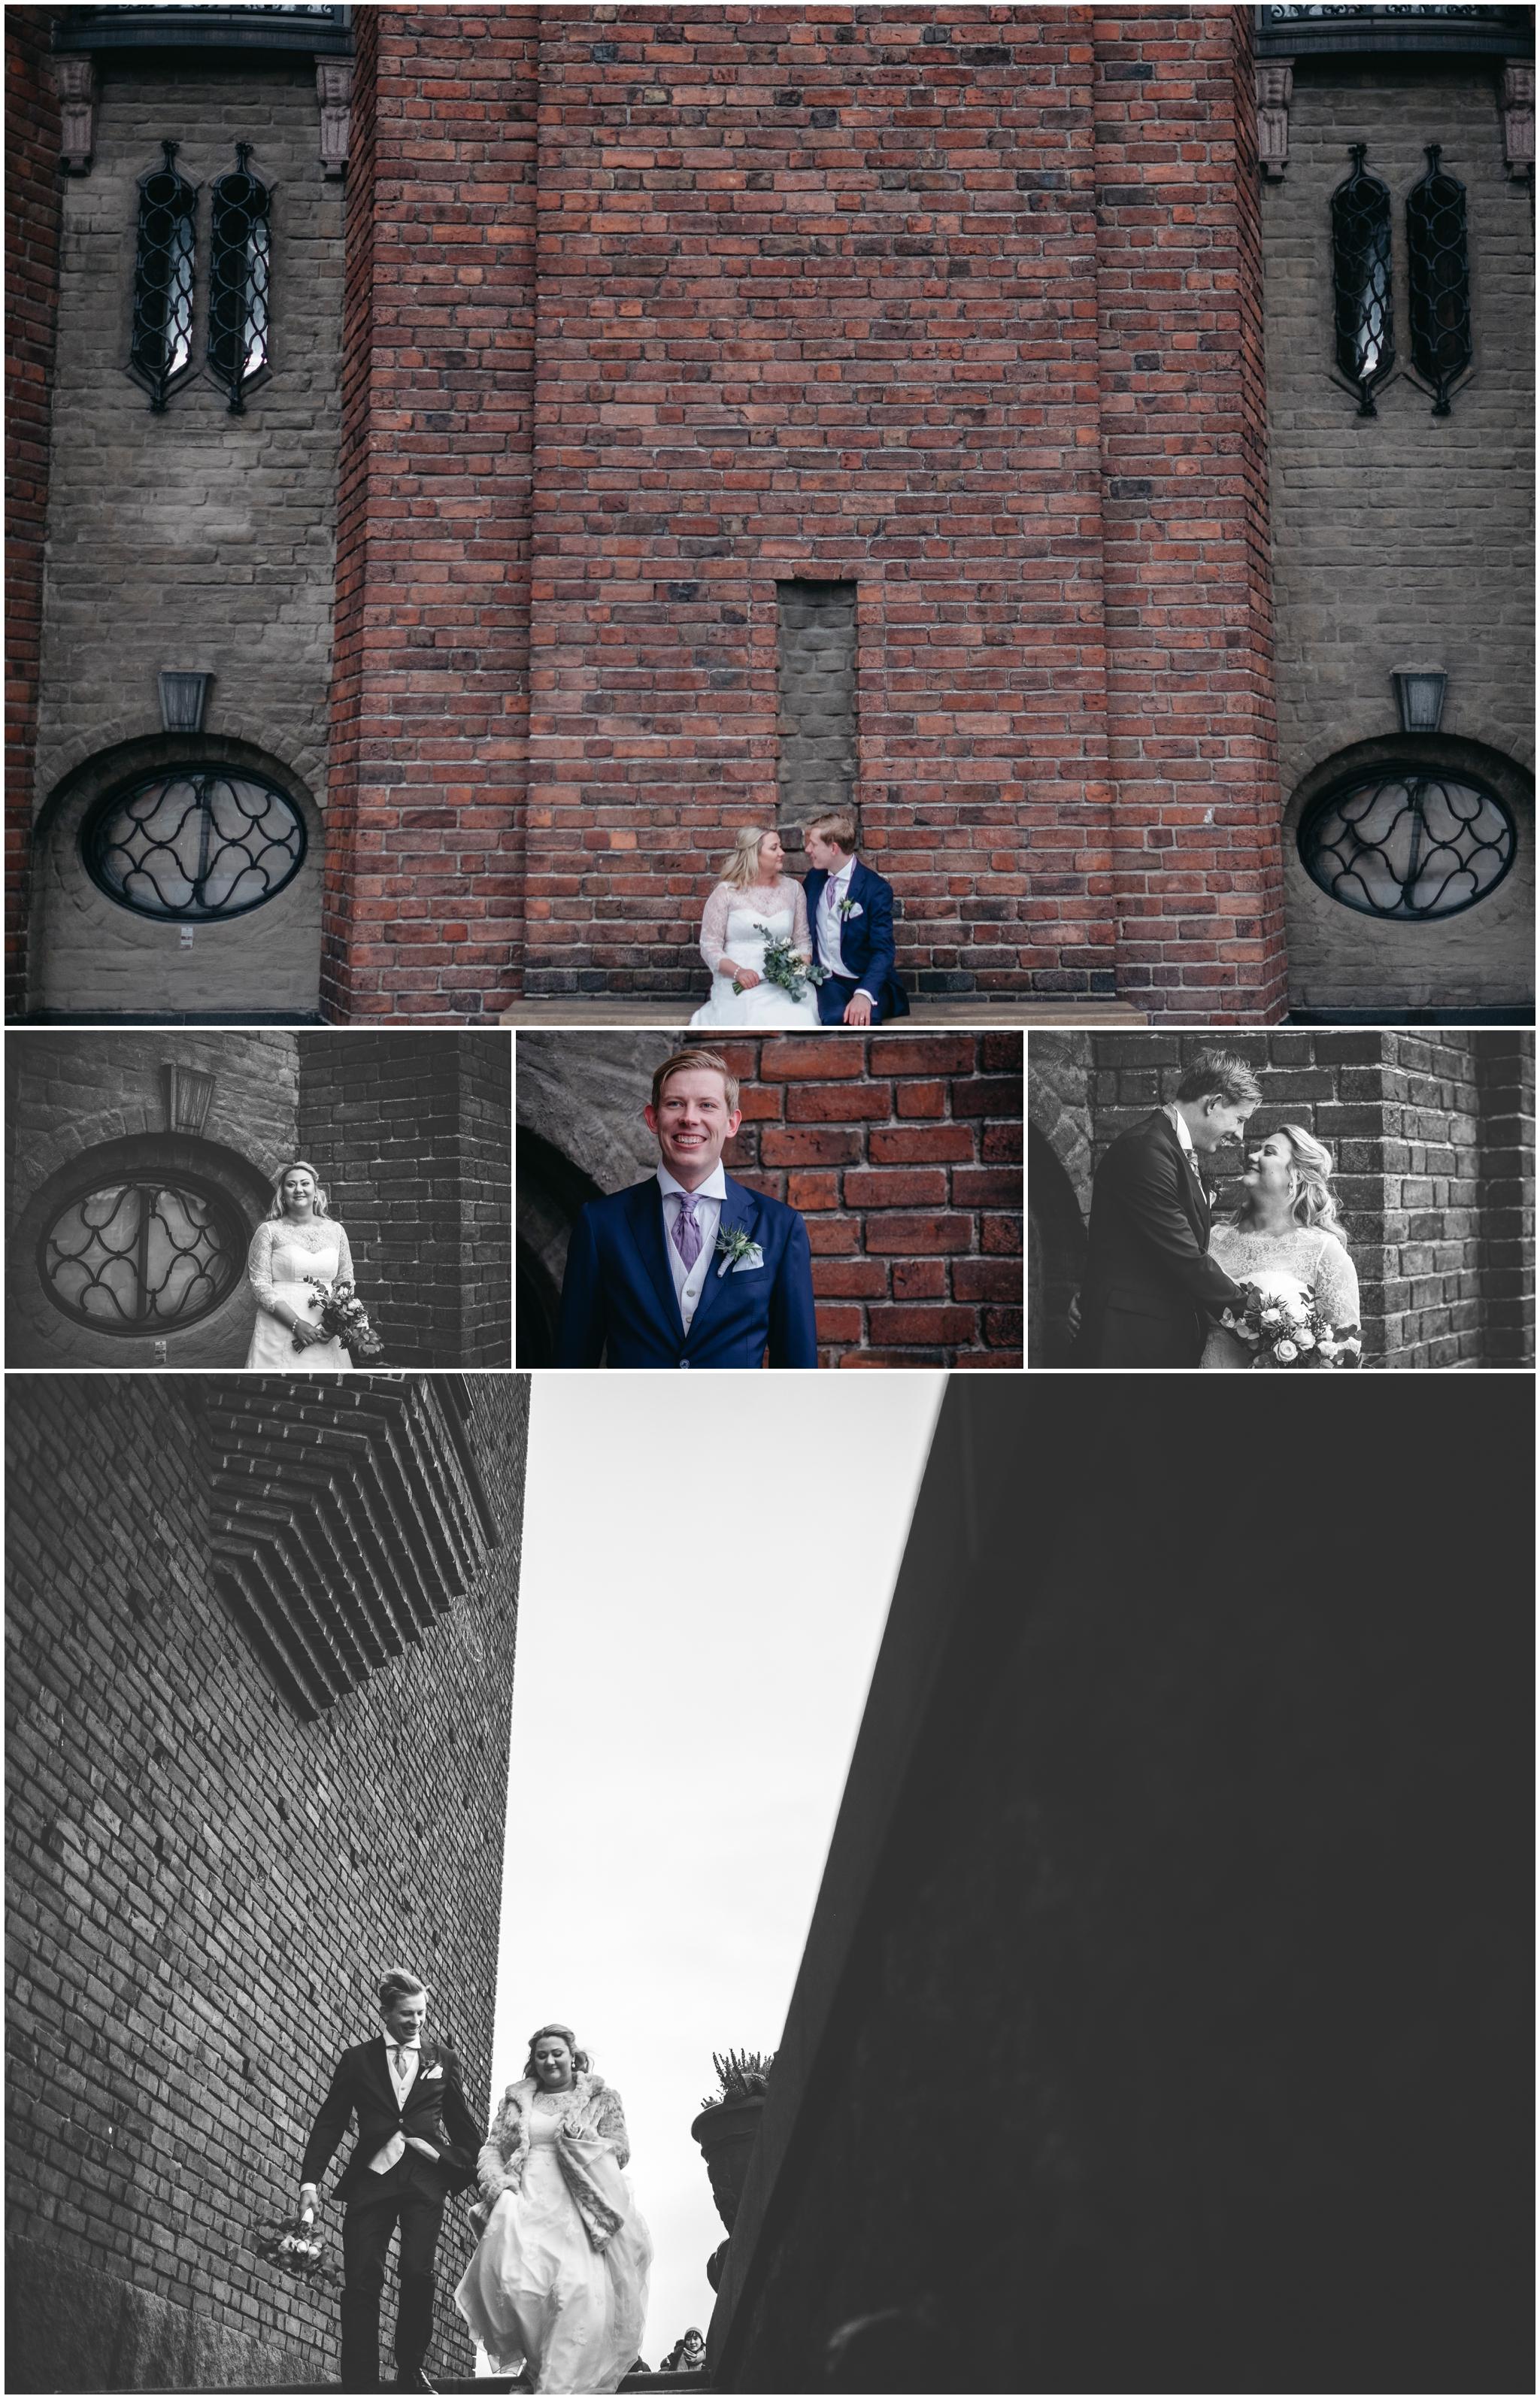 brollopsfotograf stadshuset stockholm brollop i stadshuset vigsel i stadshuset borgerlig vigsel linda rehlin cecilia pihl